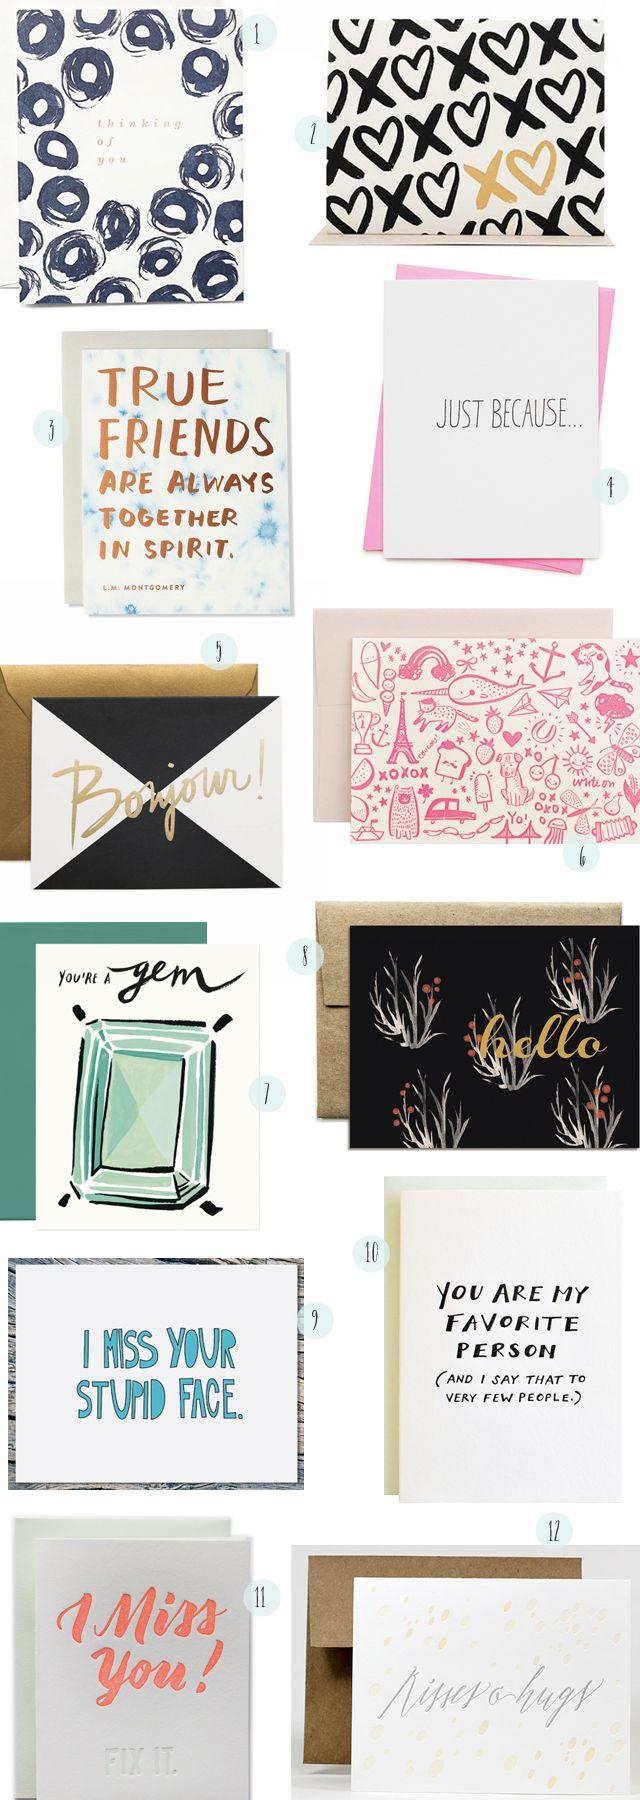 Just Because Cards: http://ohsobeautifulpaper.com/2015/04/stationery-a-z-just-because-cards/ | 1. Moglea; 2. Meeschmosh; 3. Sycamore Street Press; 4. Ashkahn; 5. Garance Doré for Rifle Paper Co.; 6. Hello!Lucky; 7. Idlewild Co.; 8. Ferme à Papier; 9. Near Modern Disaster; 10. Odd Daughter Co.; 11. Ladyfingers Letterpress; 12. Lilikoi Design + Letterpress